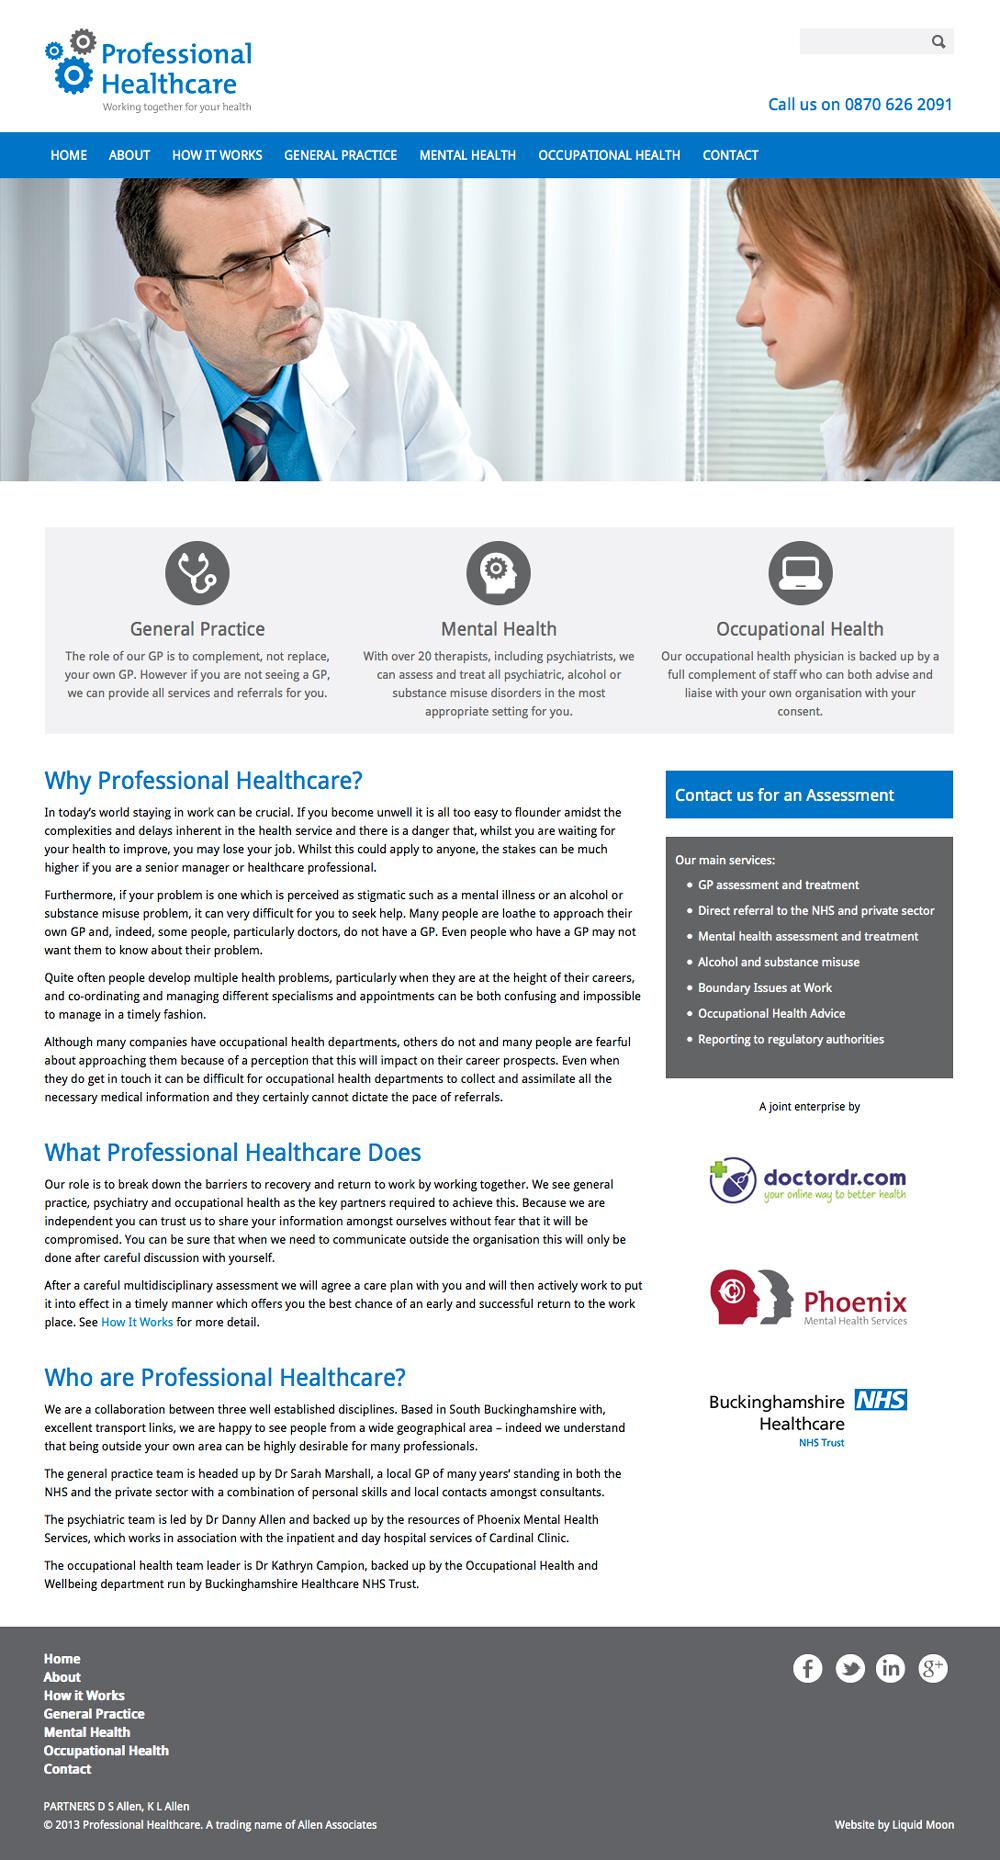 Professional Healthcare website